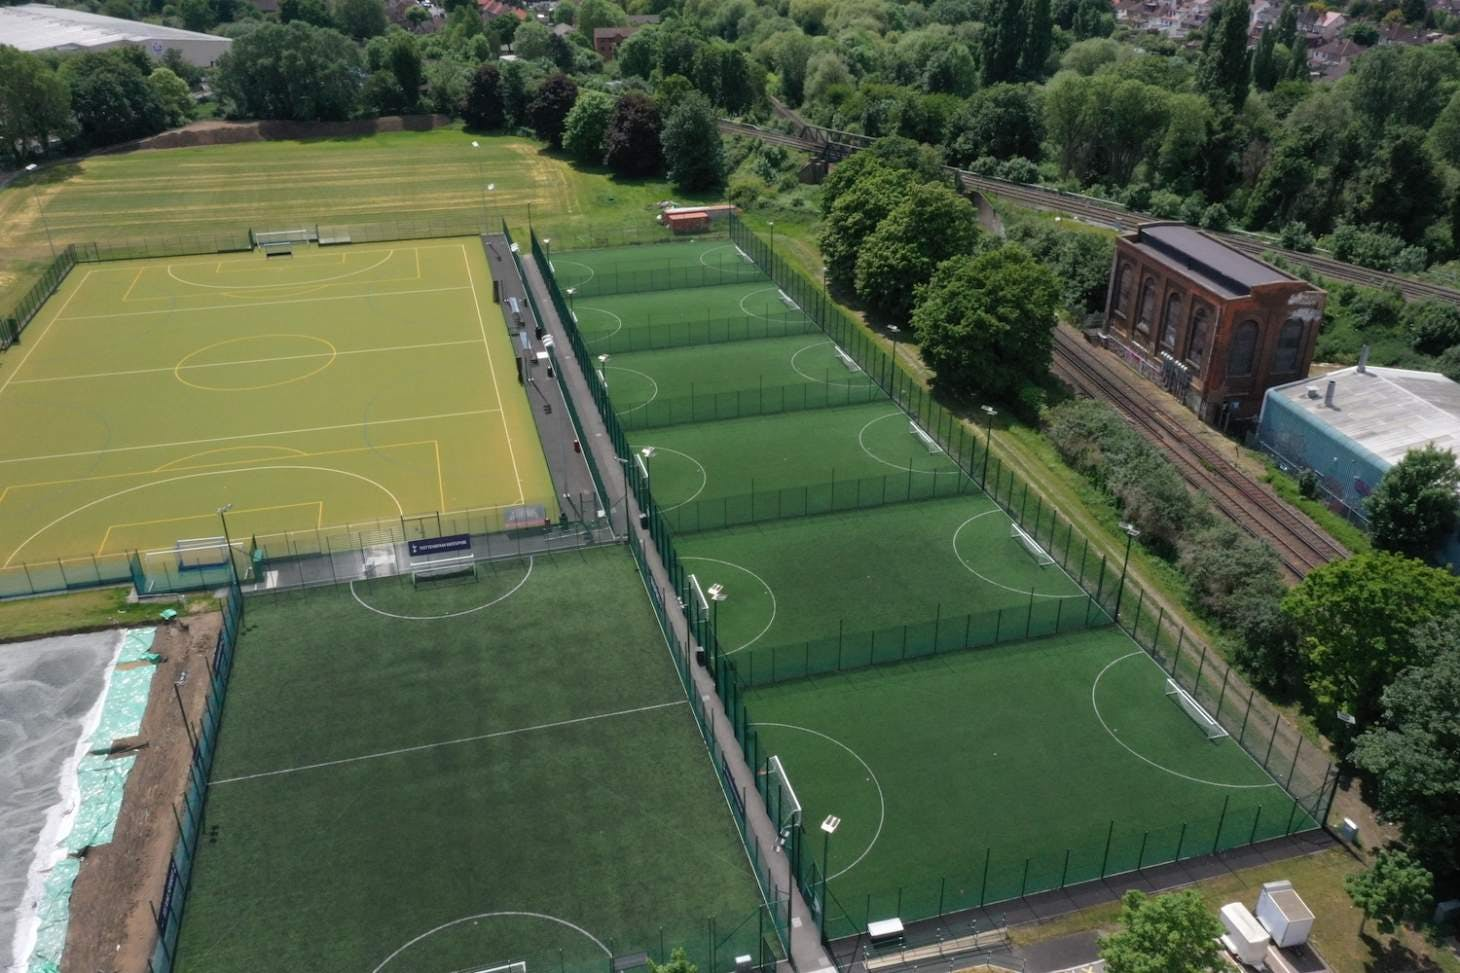 Jubilee Sports Ground (St Dunstan's Enterprises) Outdoor | Astroturf hockey pitch